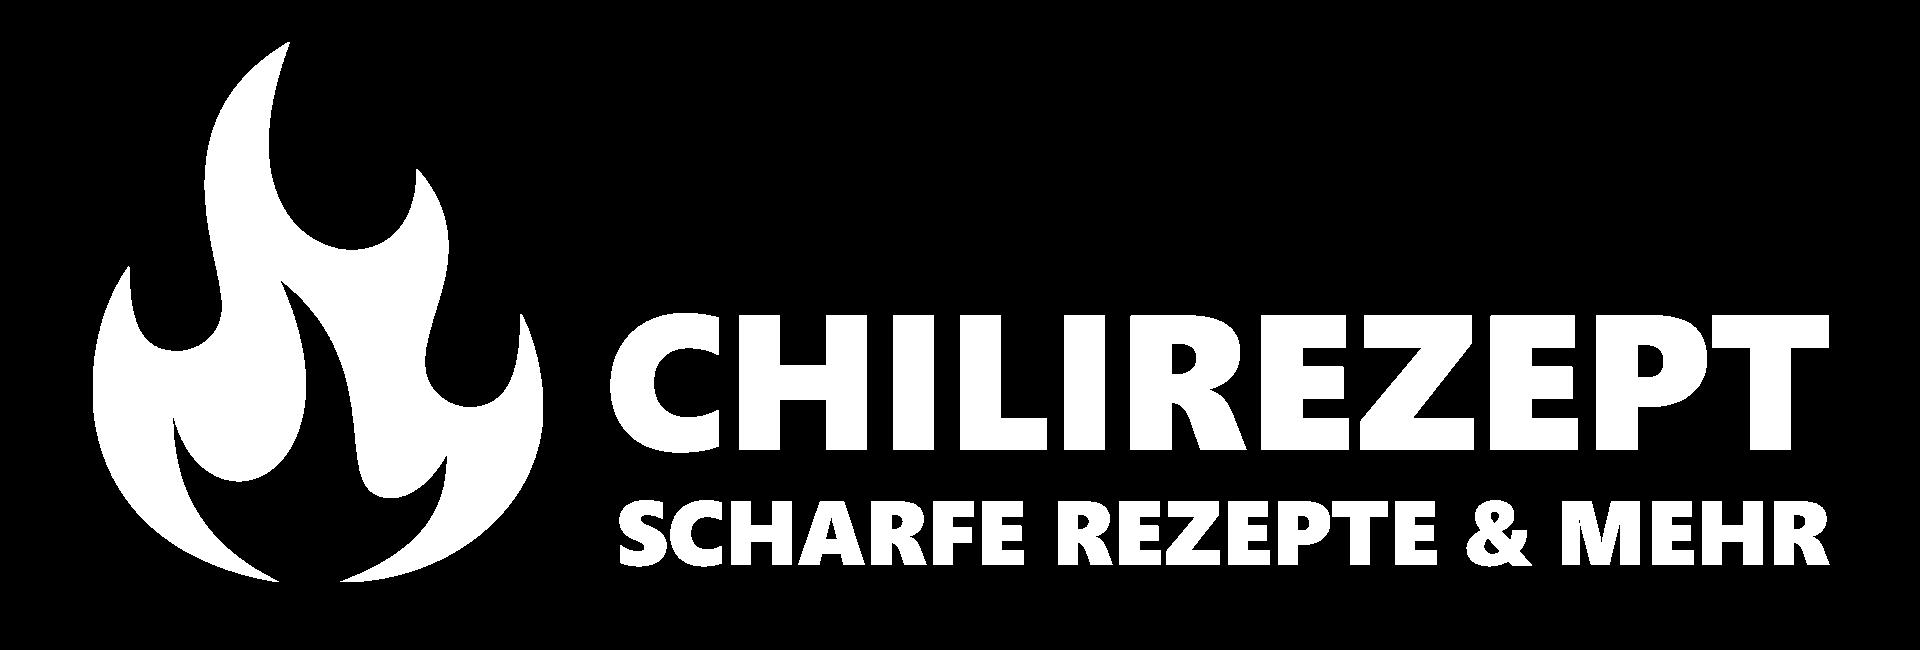 Chilirezept Logo Blank